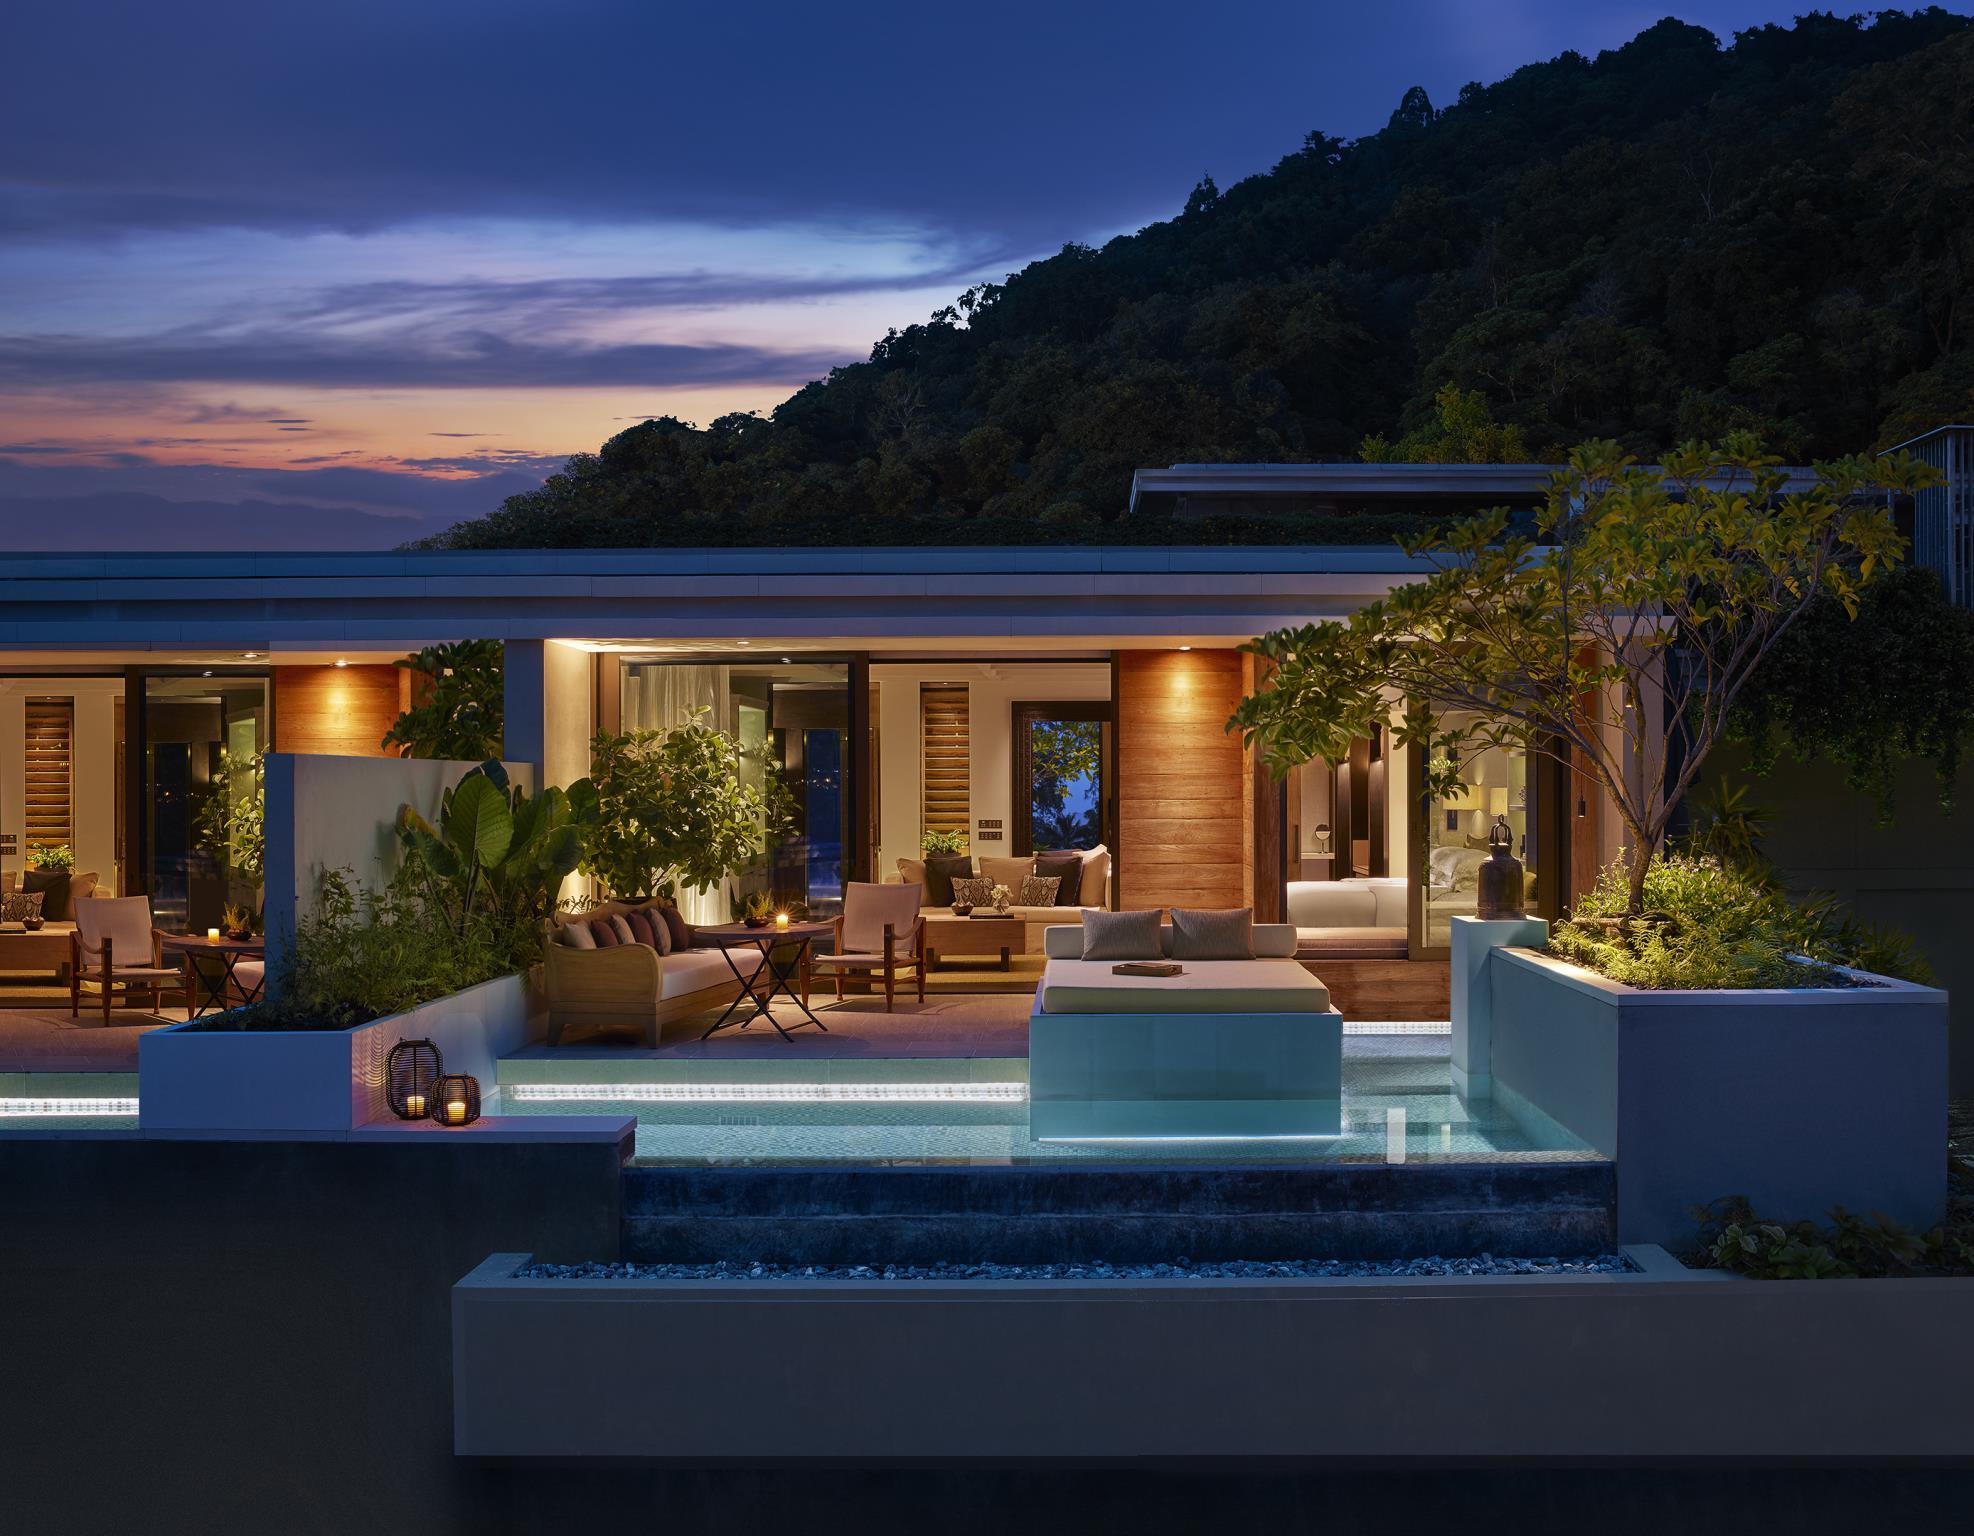 Rosewood Phuket - Top 10 best luxury resorts and hotels in Phuket